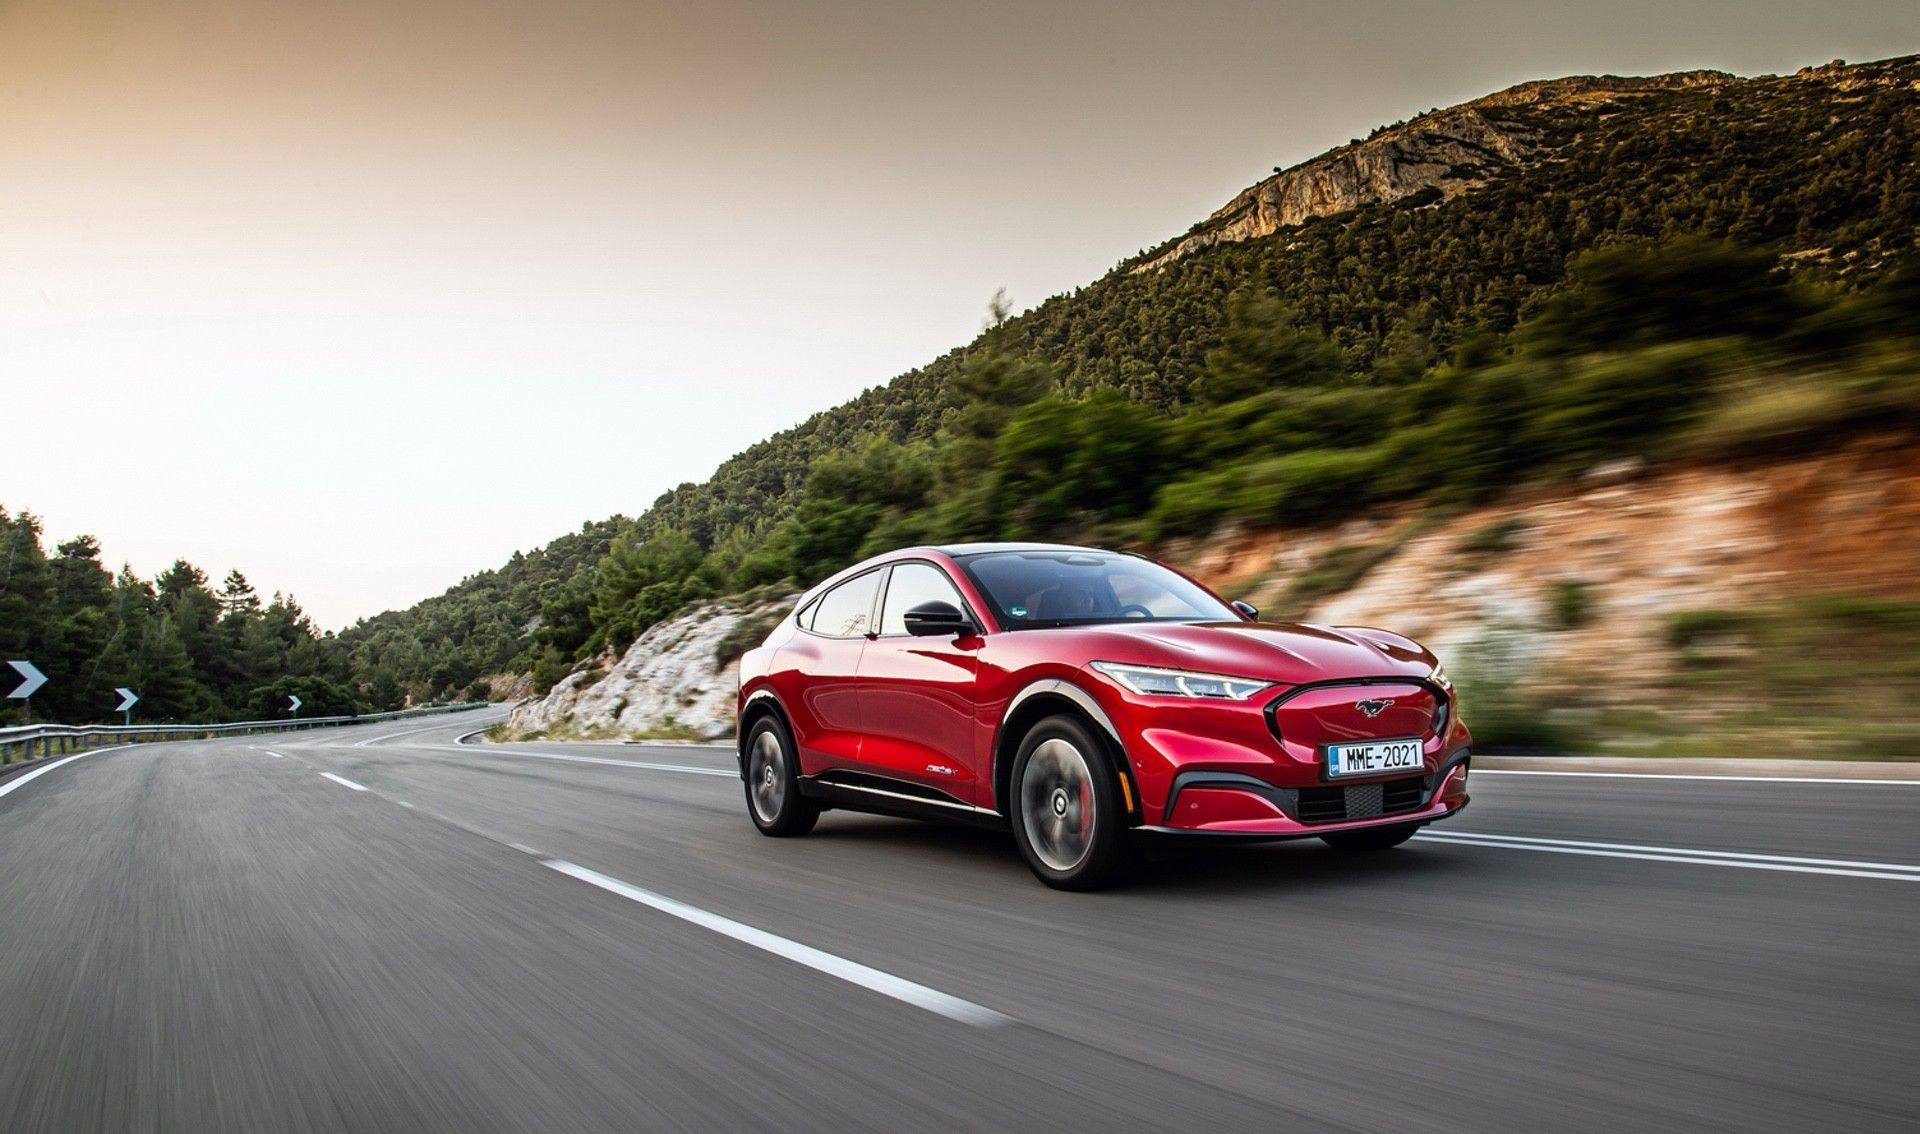 Ford_Mustang_Mach-E_greek_presskit-0078